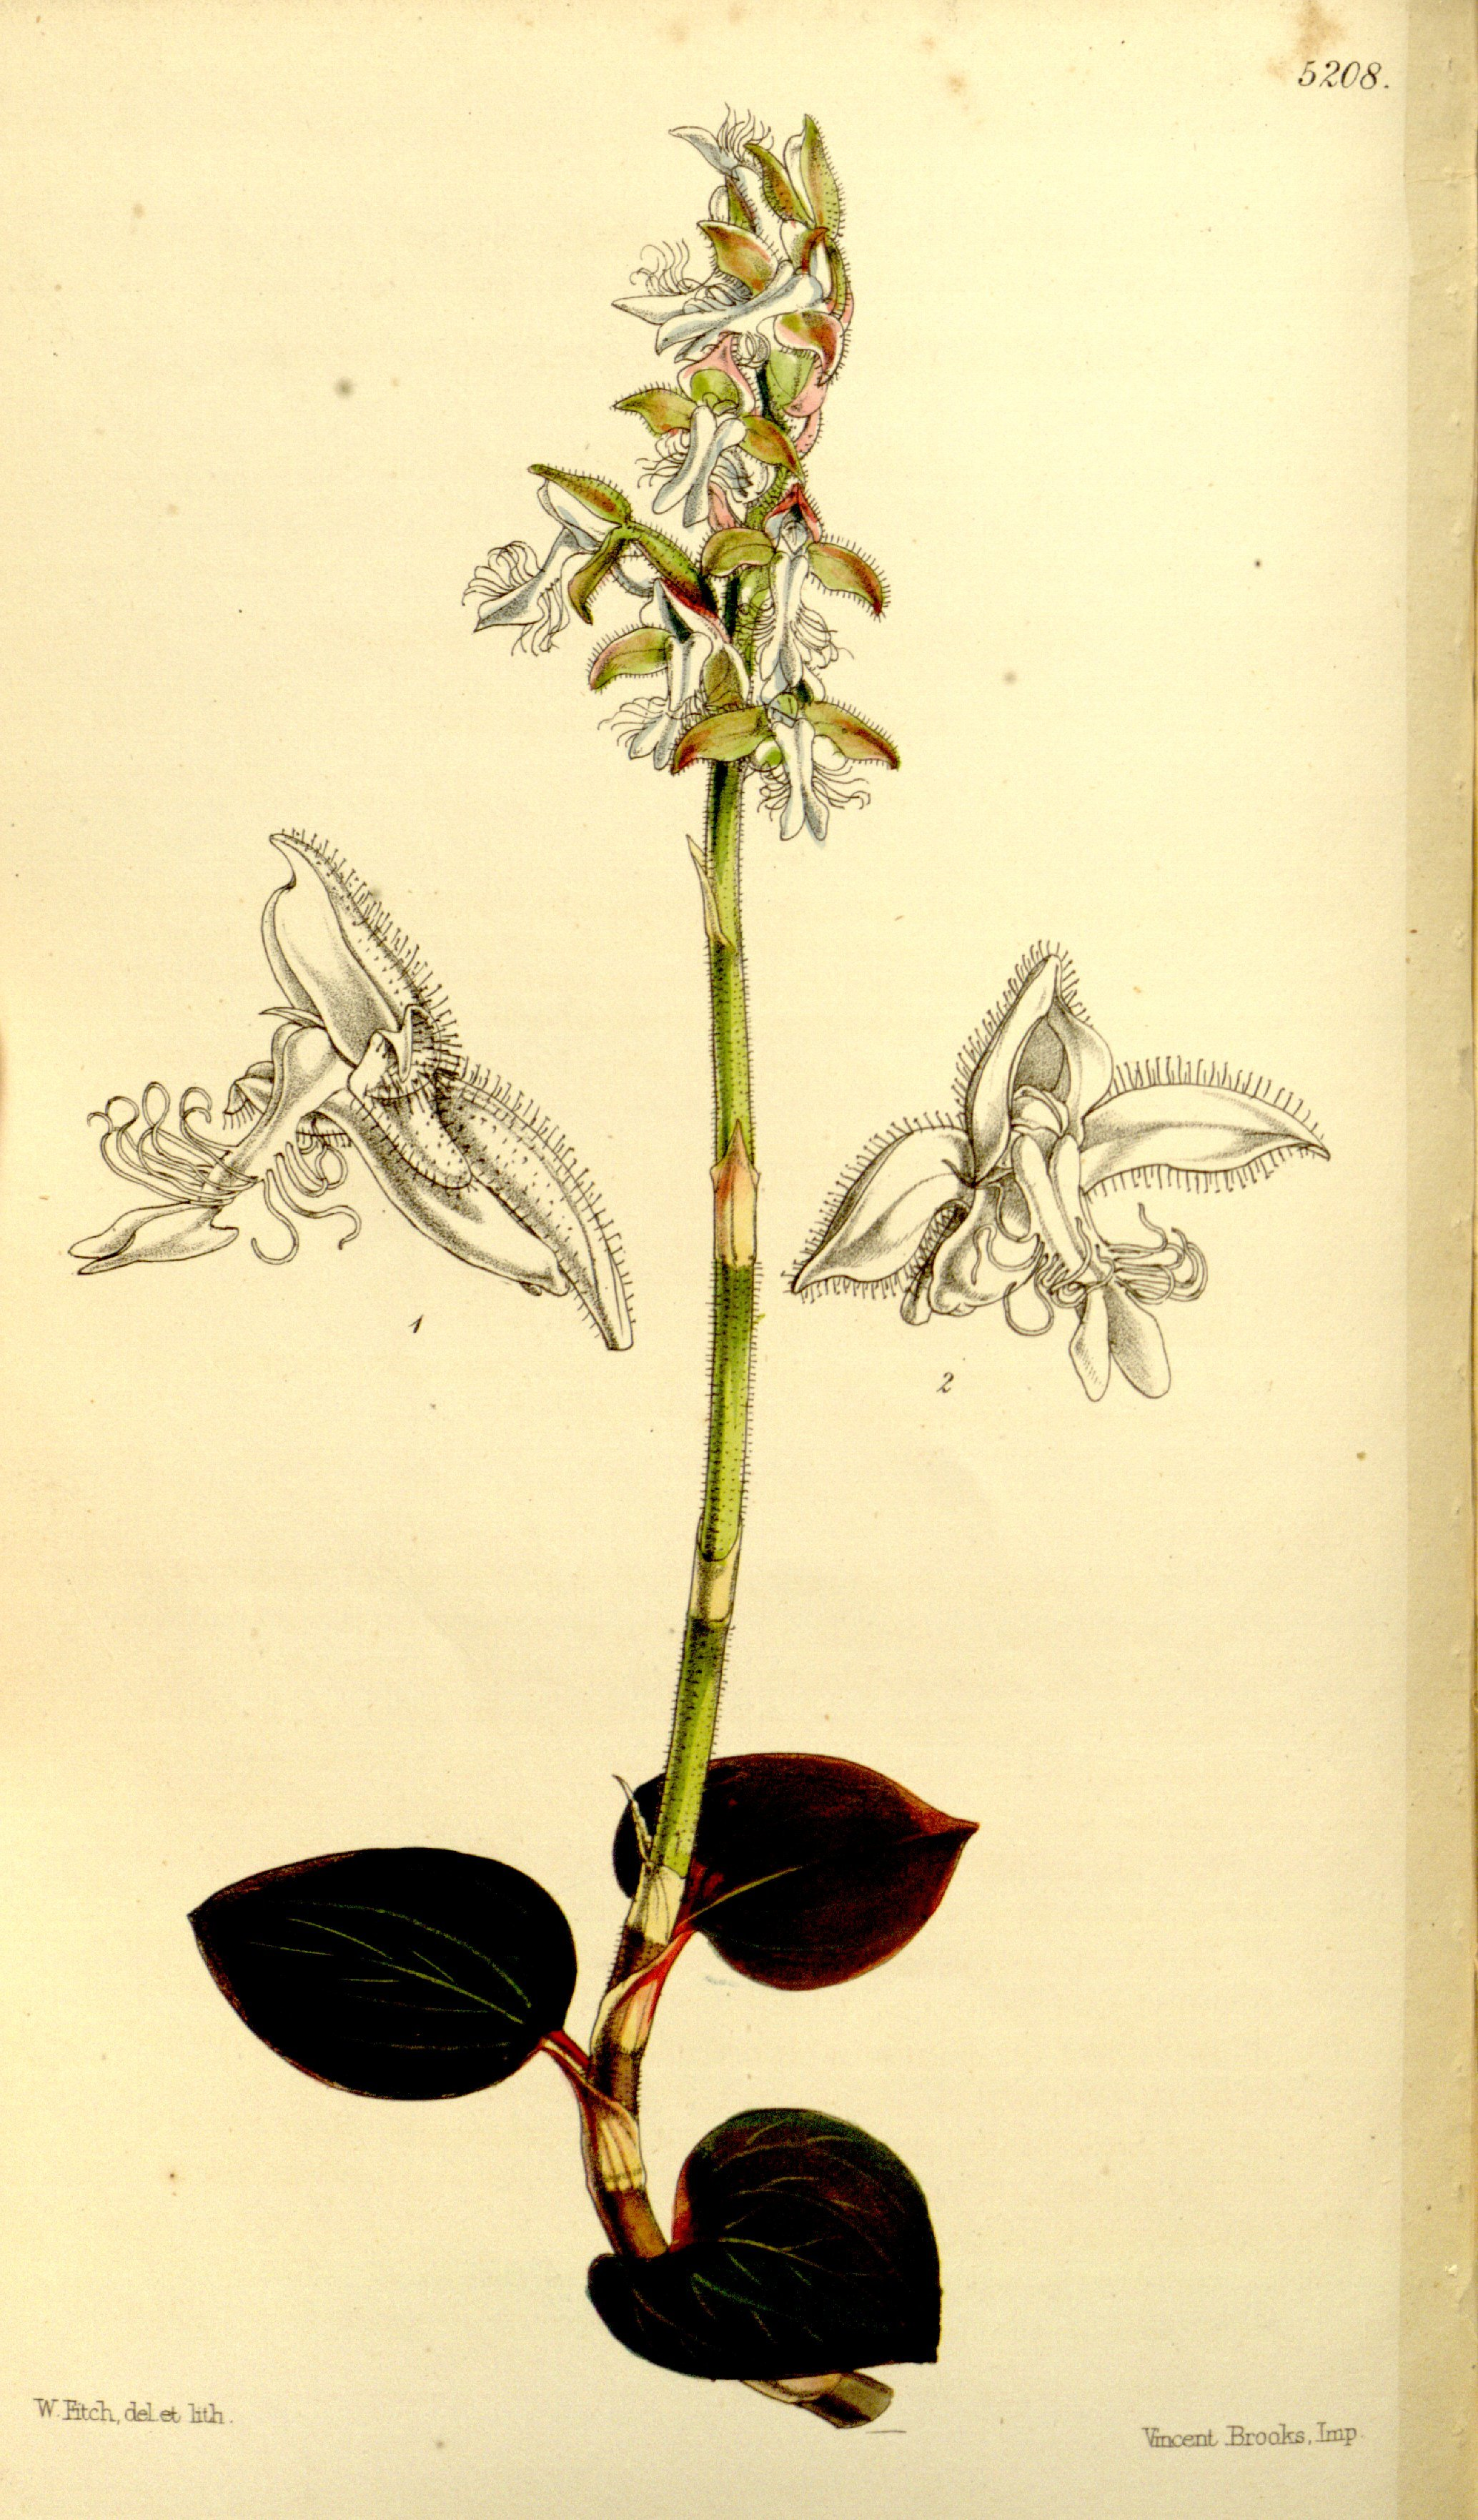 Image of Bristly Anoectochilus